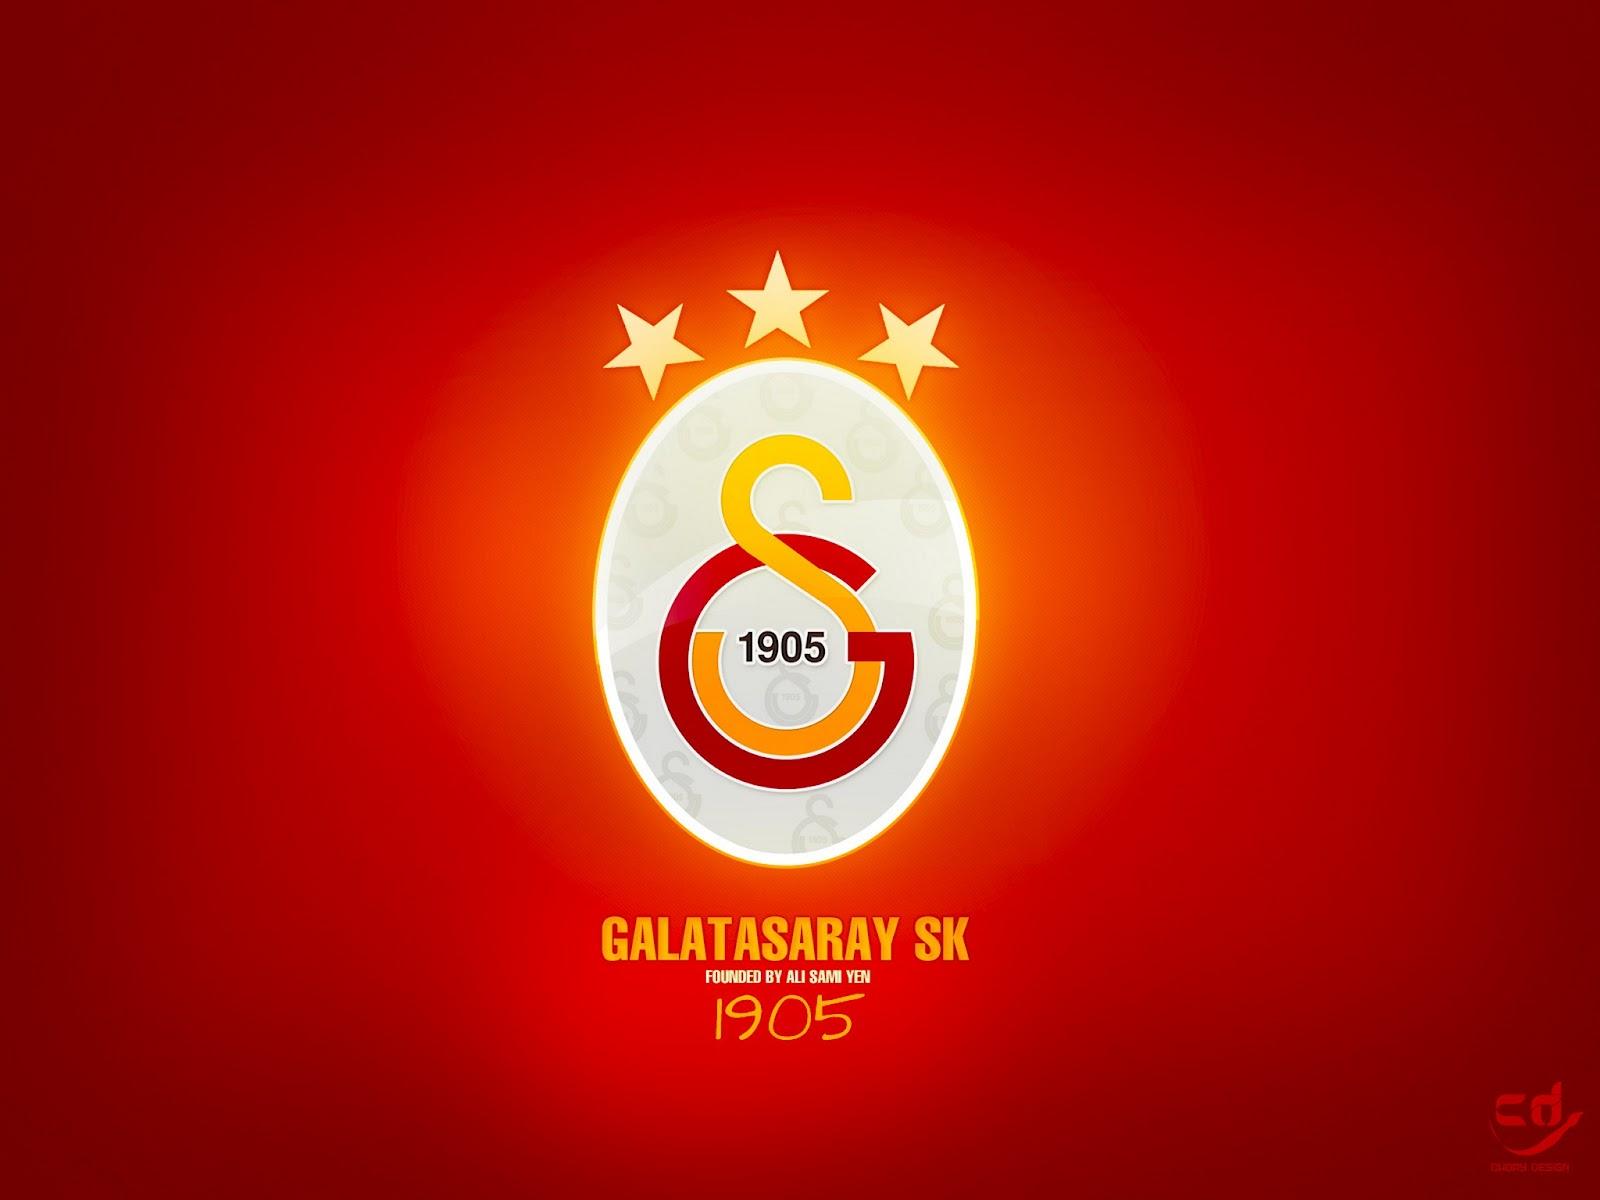 http://4.bp.blogspot.com/-Ogt9pkW94O0/T-2XfUWD7rI/AAAAAAAACYQ/GTZChBwF074/s1600/%C4%B0Pad+3+Galatasaray+Resimleri+%283%29.jpg